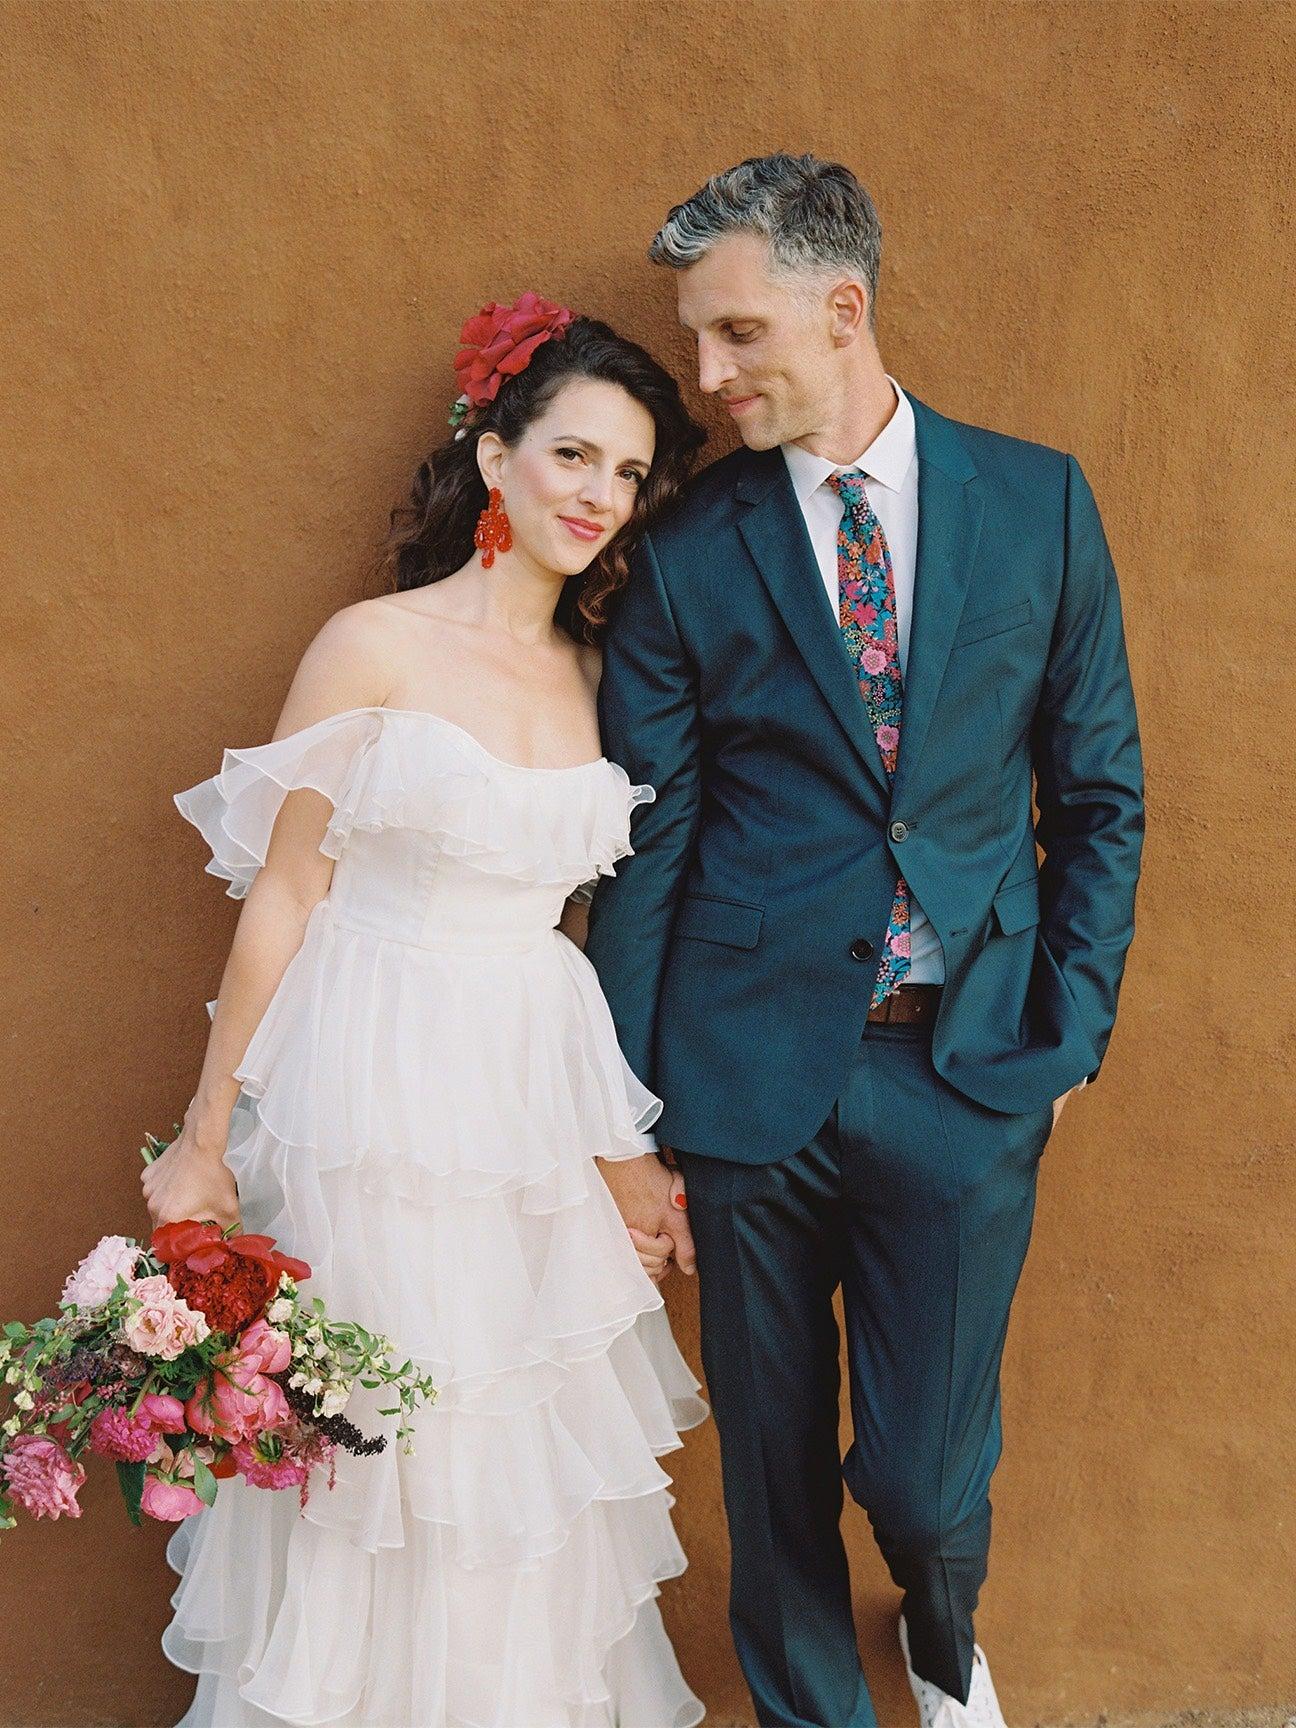 Marina Michelson and Billy Scafuri